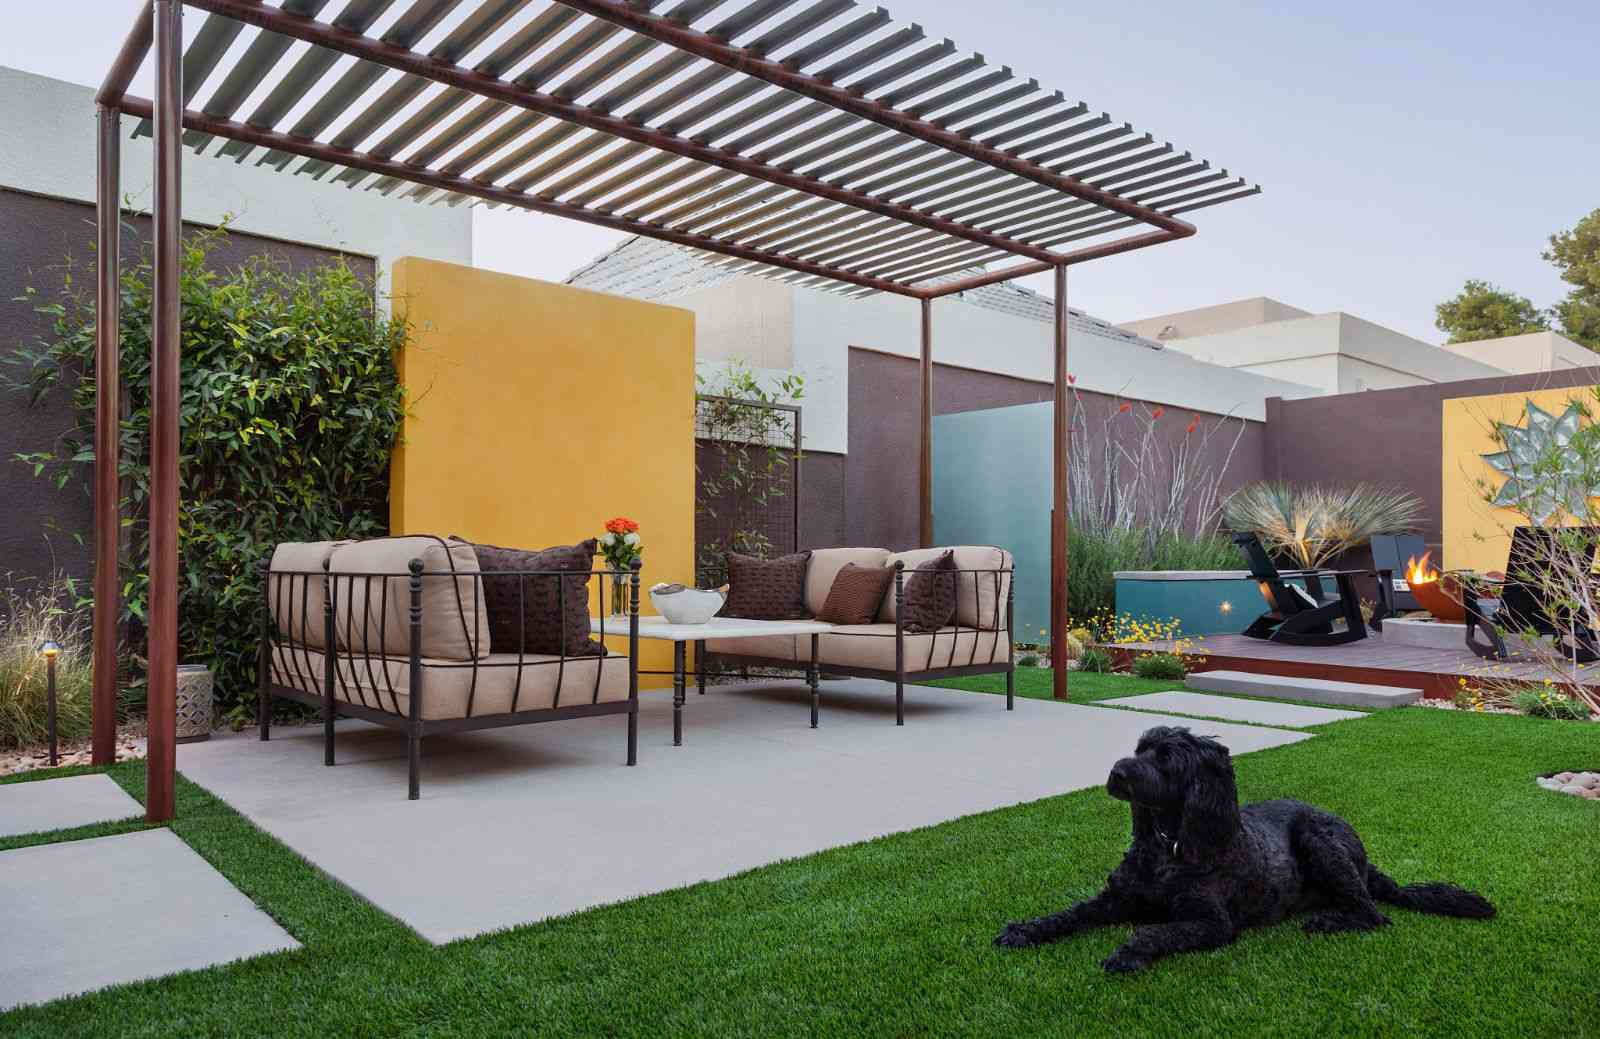 15 Beautiful Concrete Patio Ideas and Designs on Square Concrete Patio Ideas id=23713